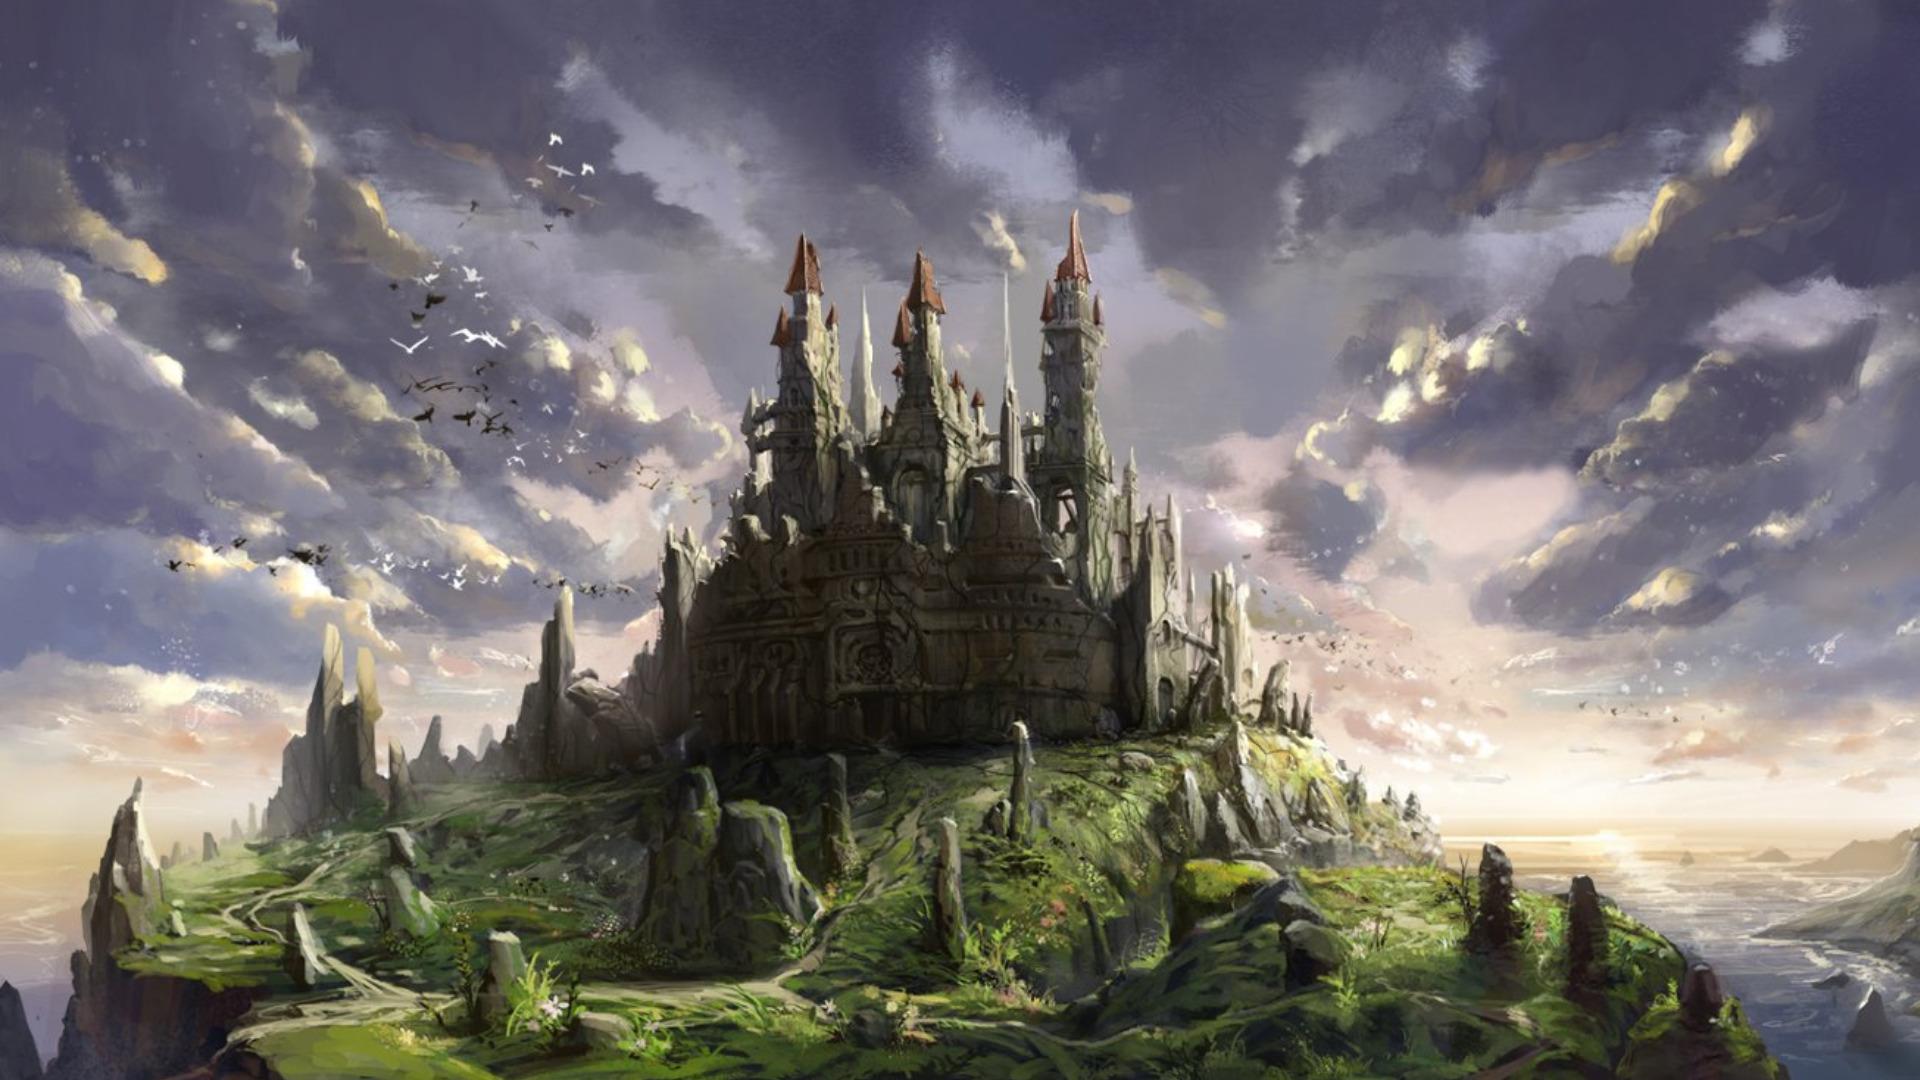 Fantasy Dark Castle Wallpaper Images amp Pictures   Becuo 1920x1080